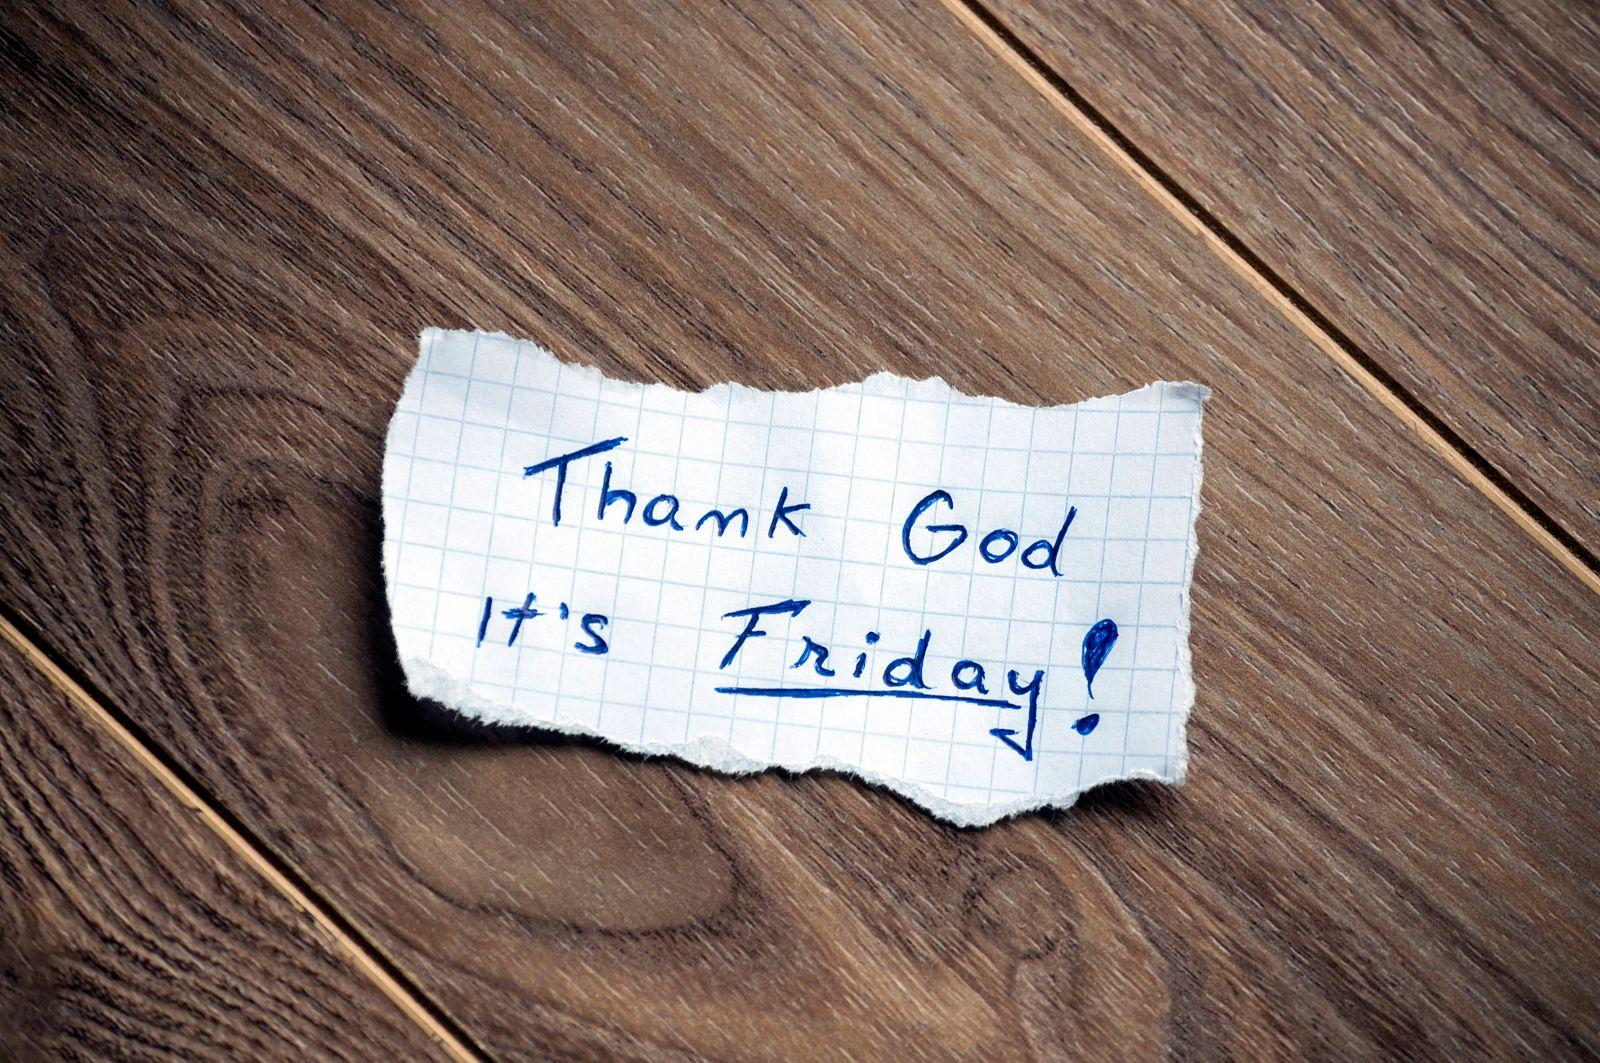 Thank God it s Friday! Friday message written on piece of paper, on a wood background. PUBLICATIONxINxGERxSUIxAUTxONLY C